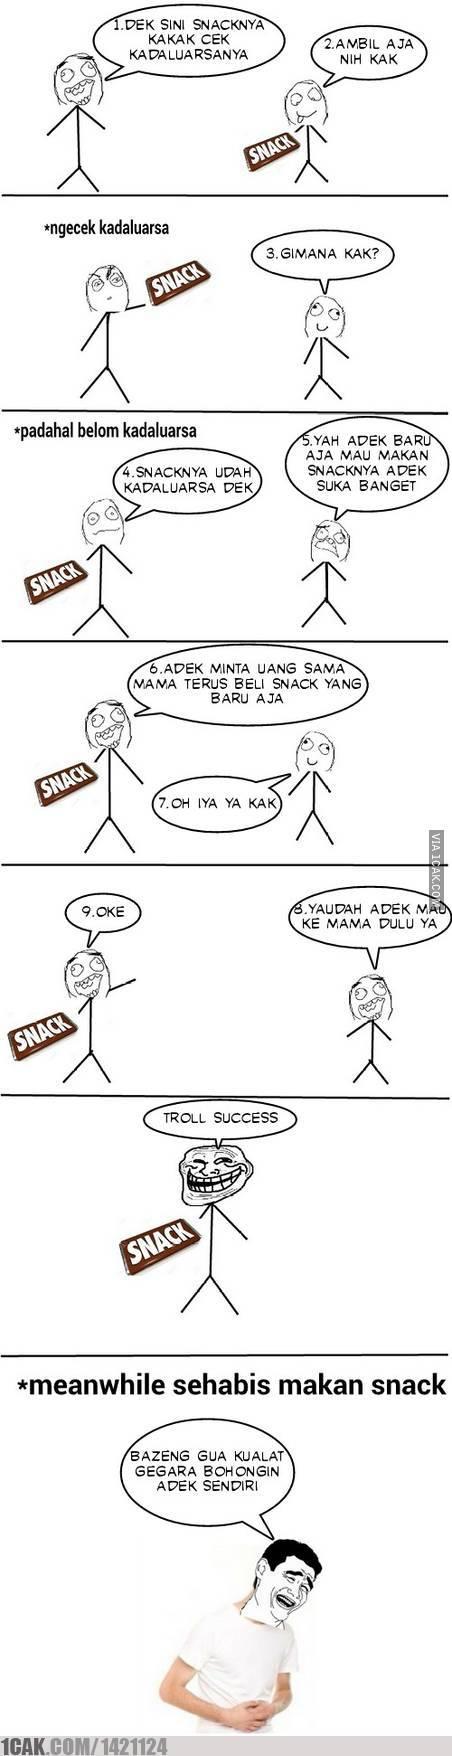 Pin By Ichwanul Muslimin On Meme Comic Indonesia Pinterest